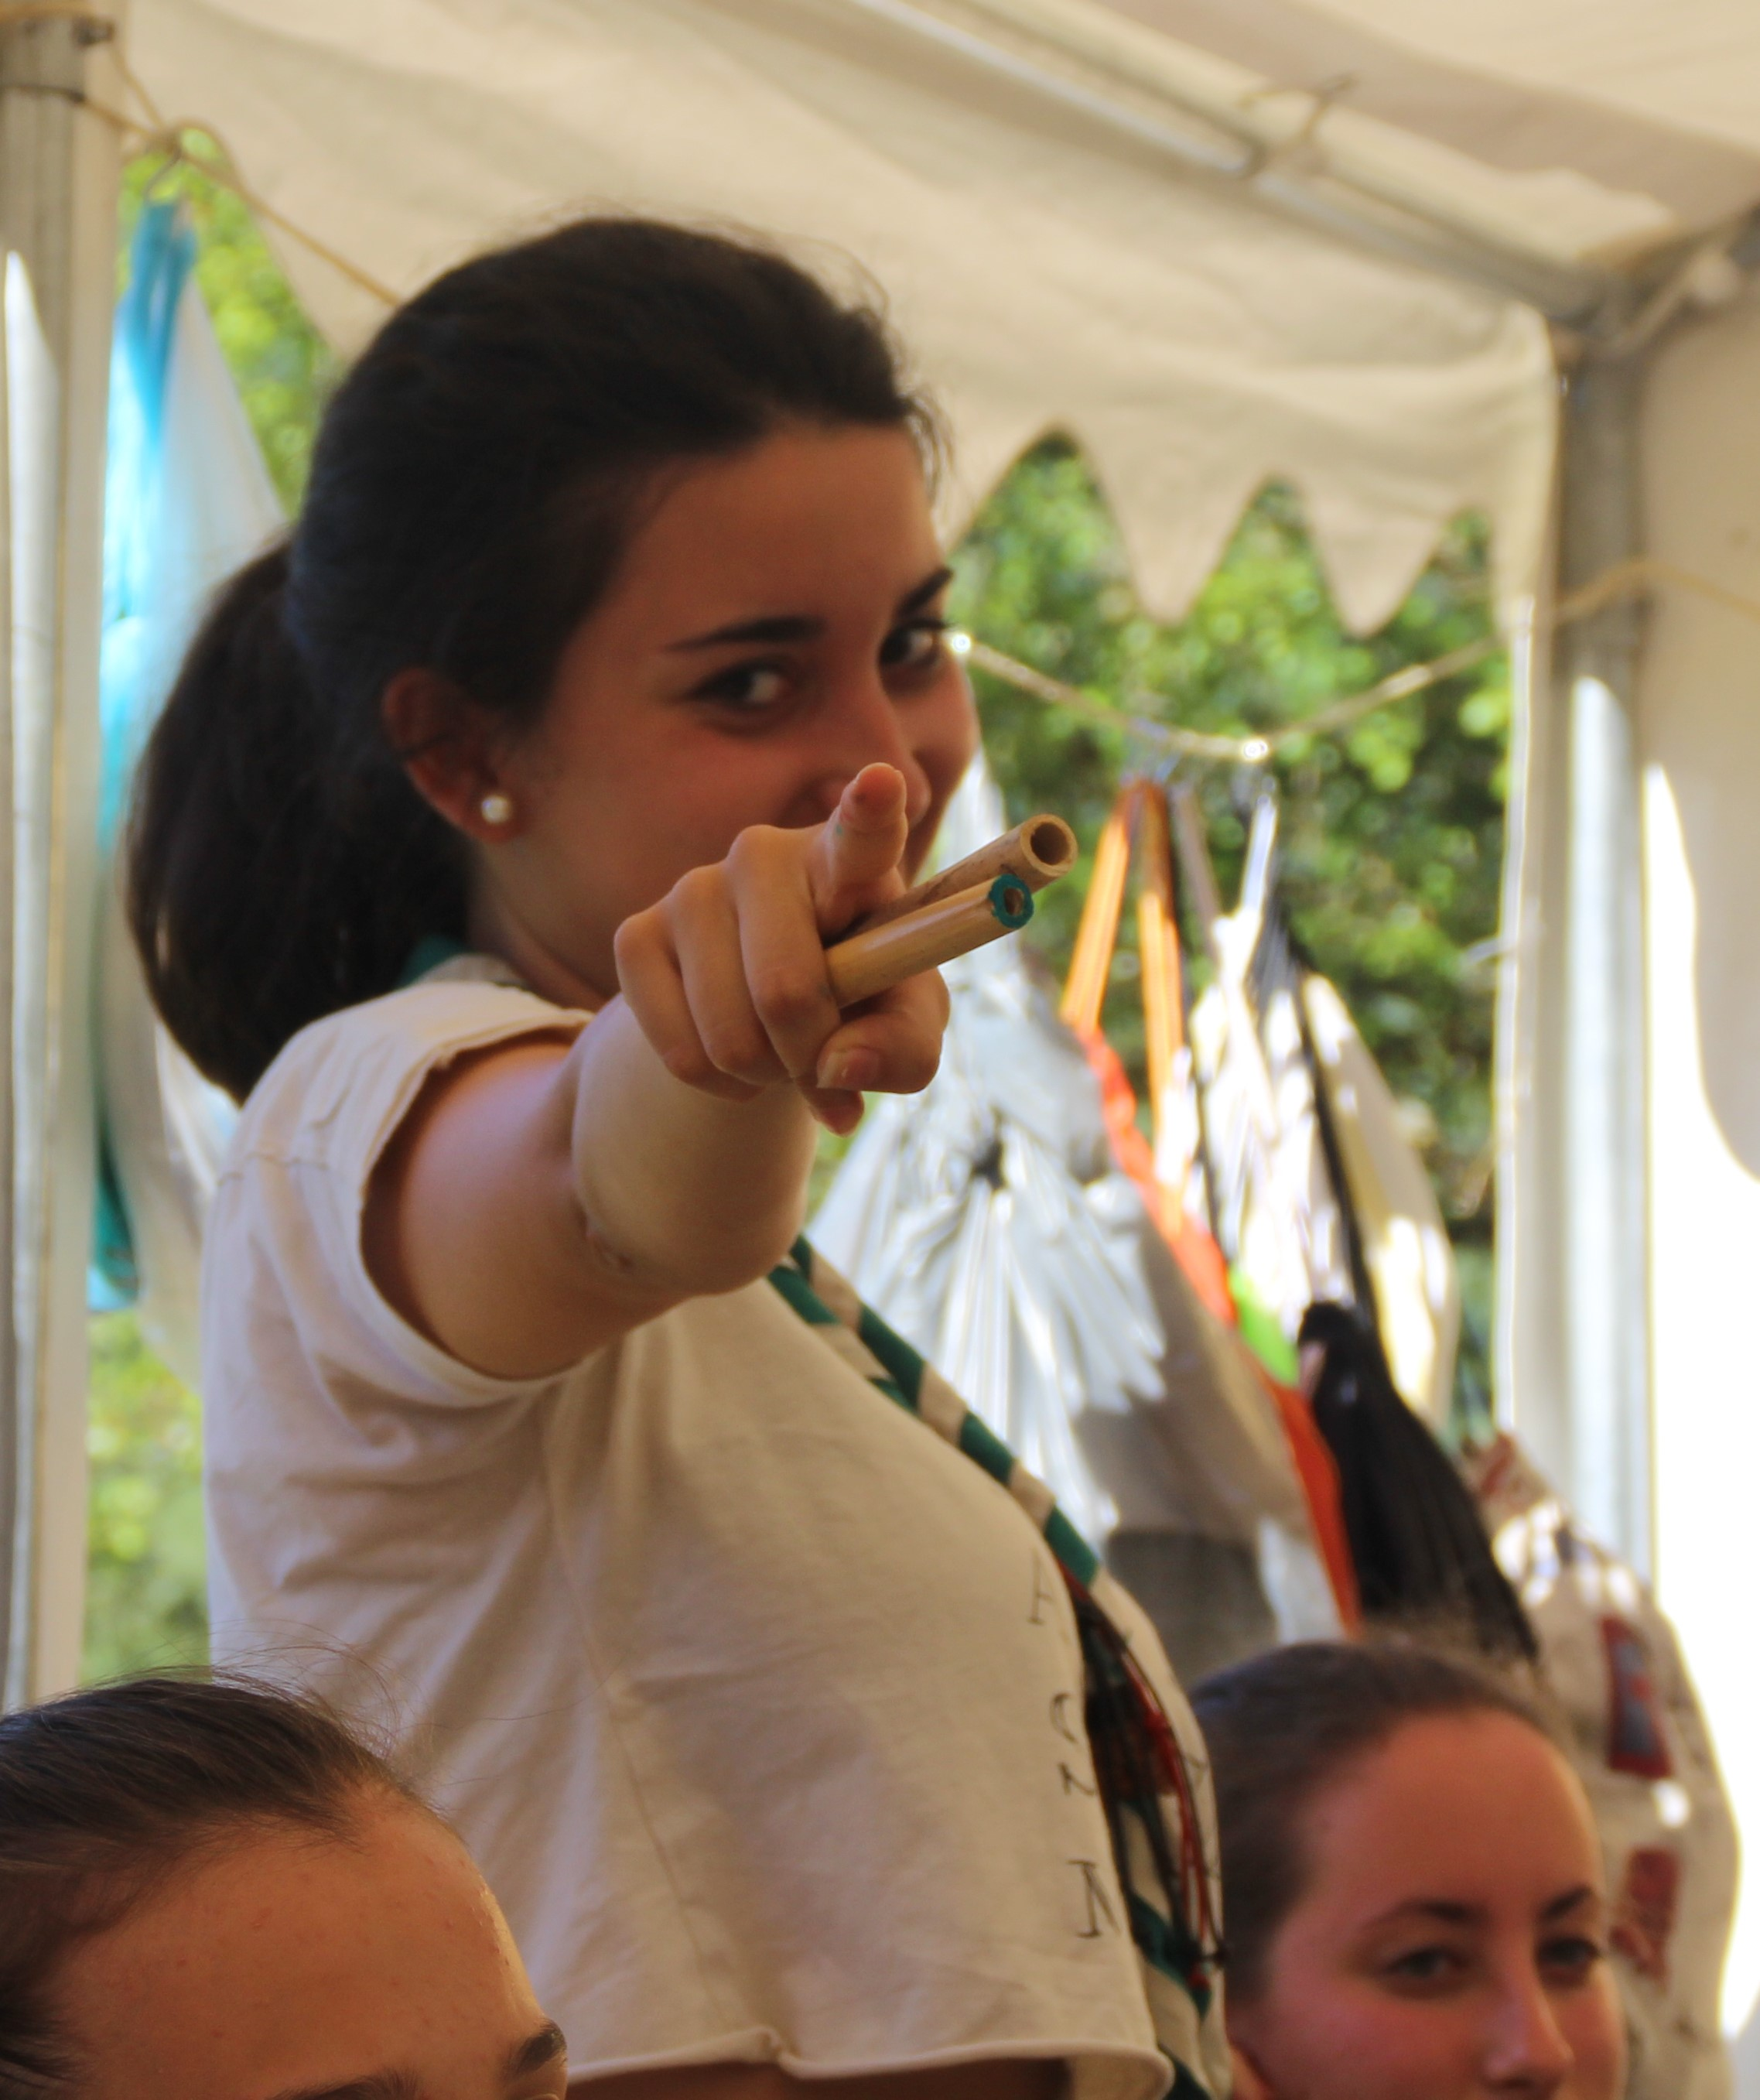 15-16 - Grupo - Campamento de verano - P58